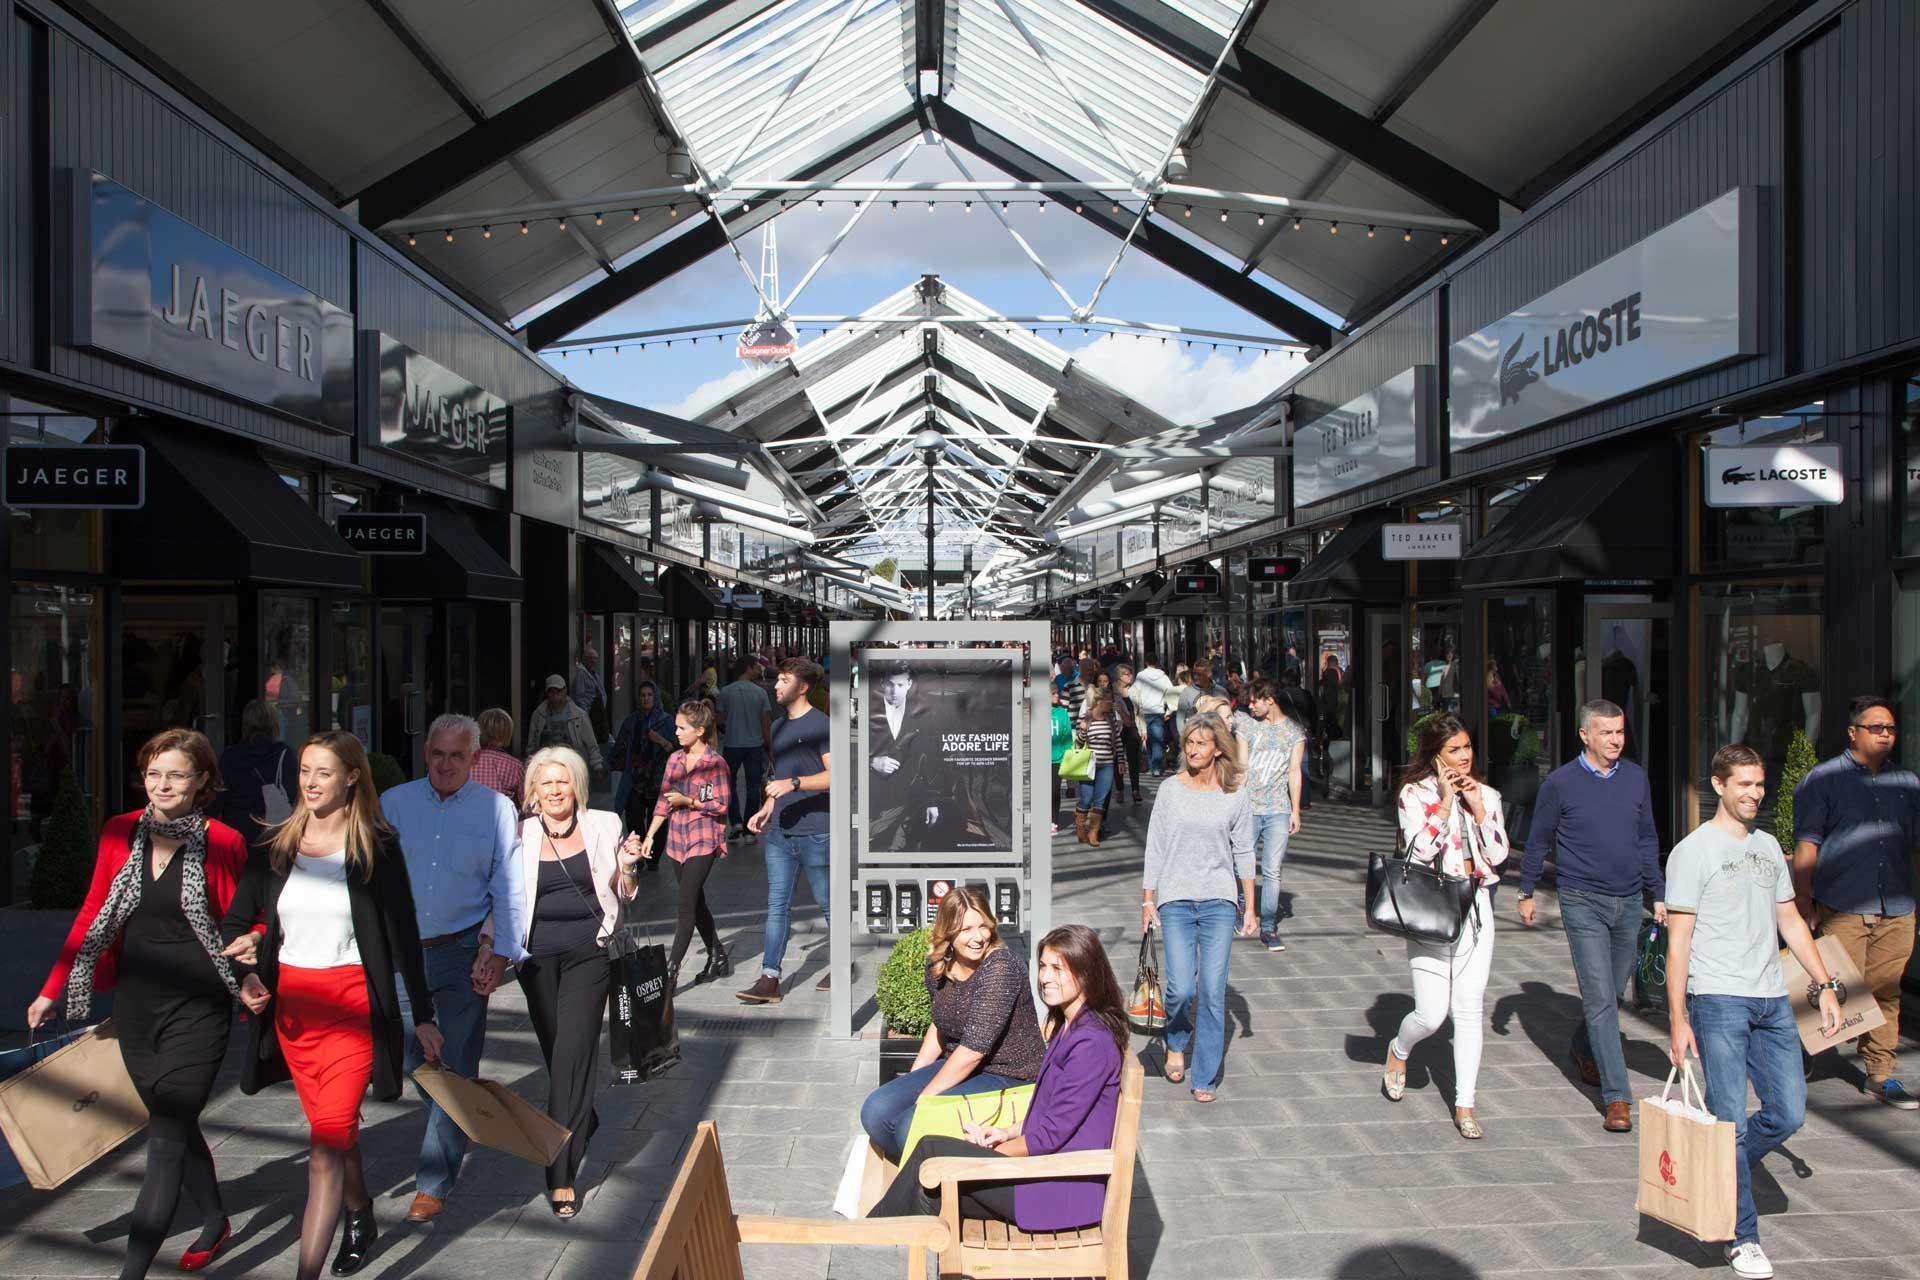 The Rhiw Shopping Centre, Bridgend